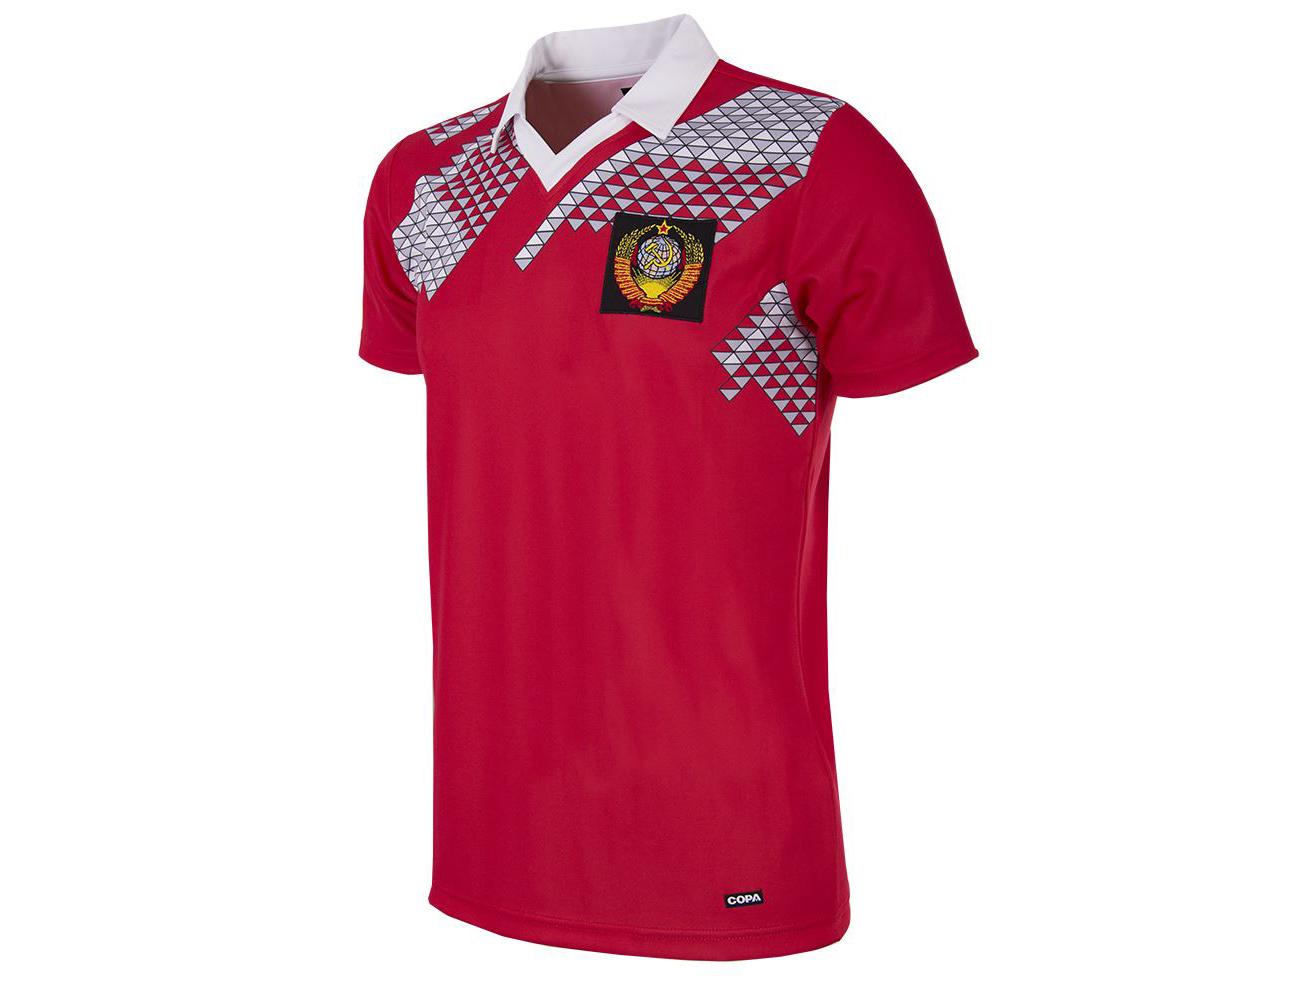 CCCP-1990-World-Cup-Short-Sleeve-Retro-Football-Shirt-4176